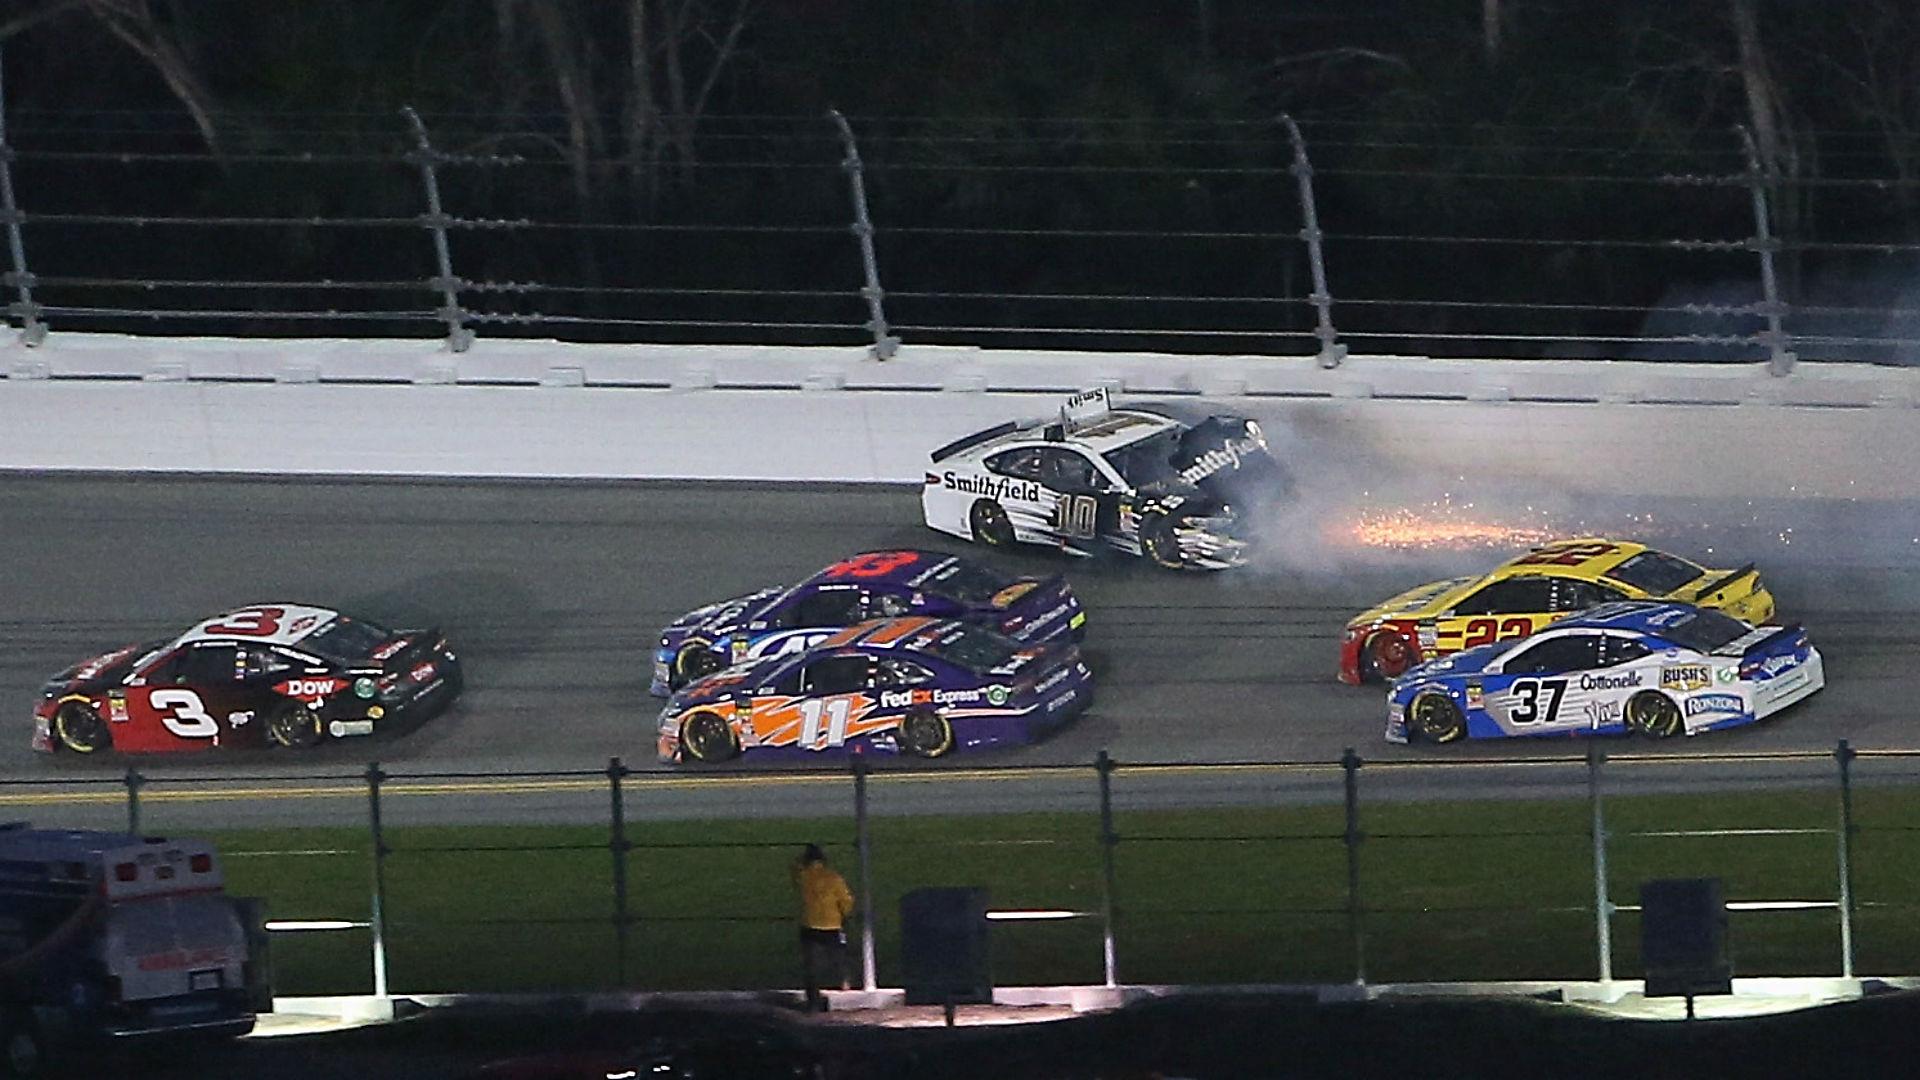 Almirola-Daytona-crash-020919-Getty-FTR.jpg